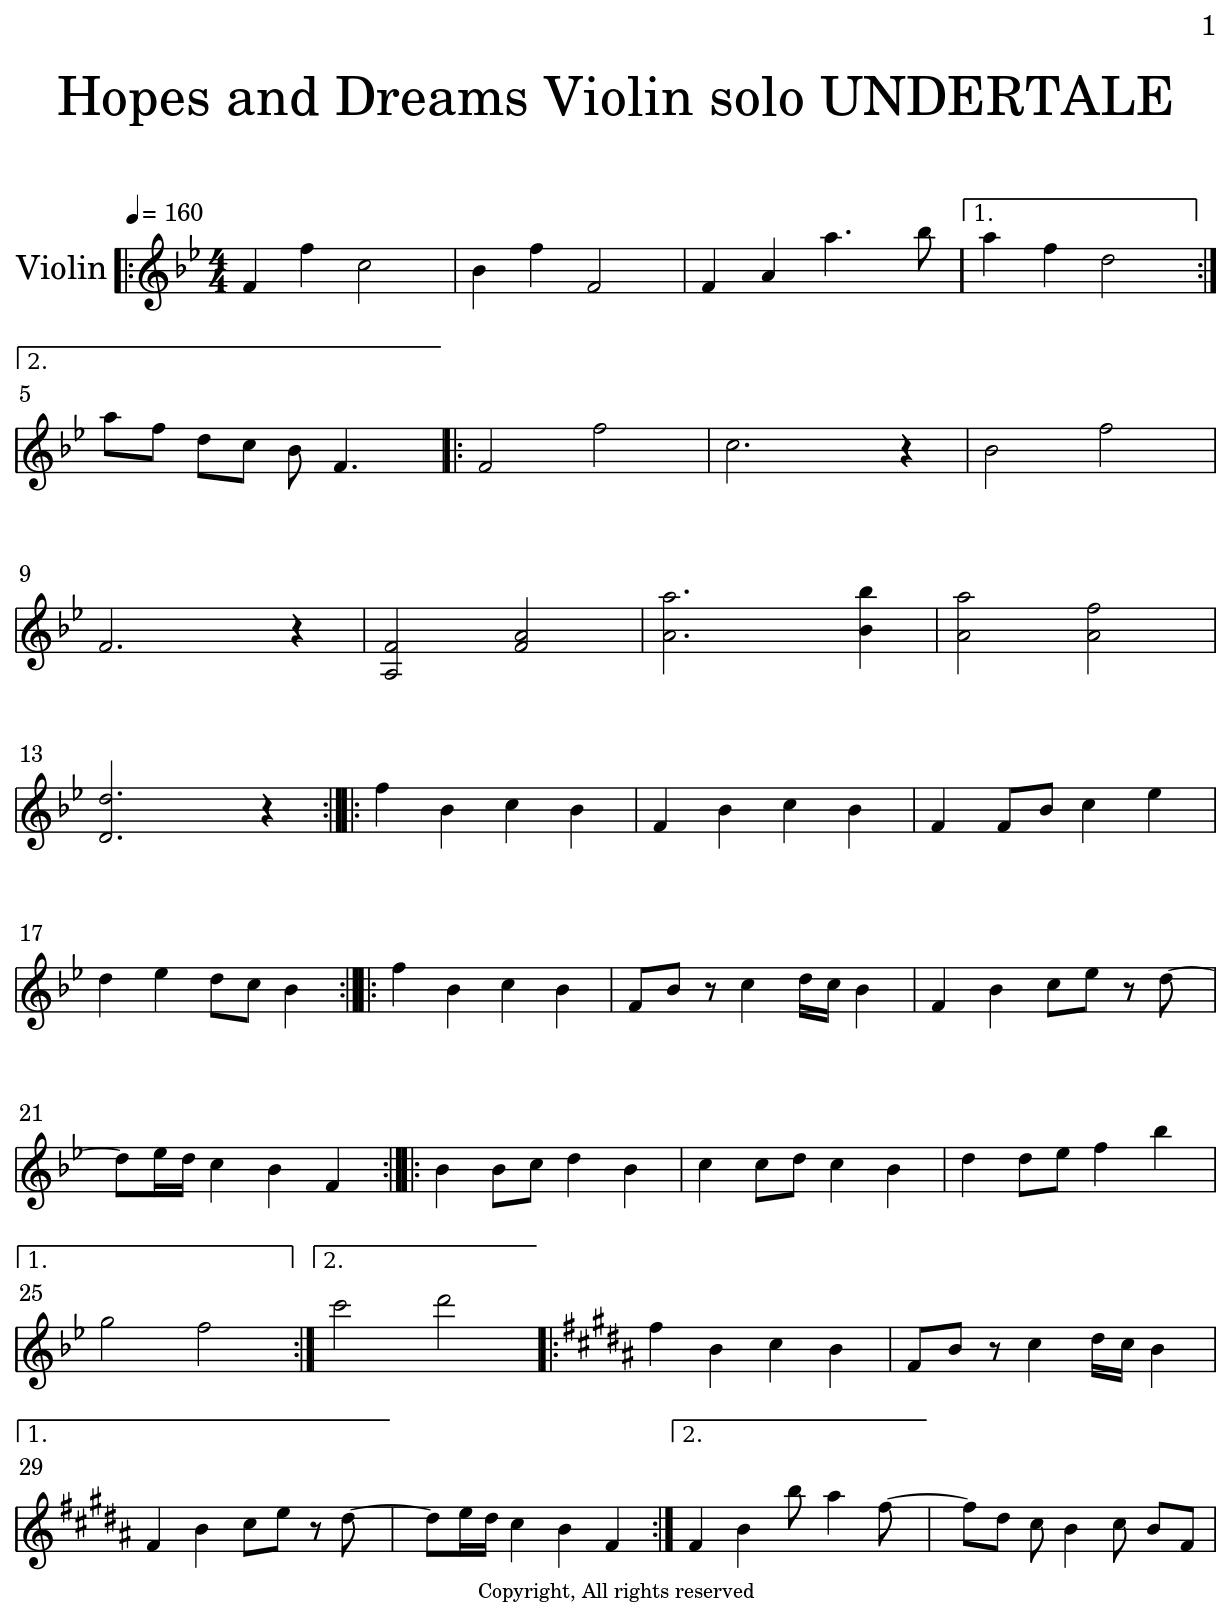 Hopes and Dreams Violin solo UNDERTALE - Flat